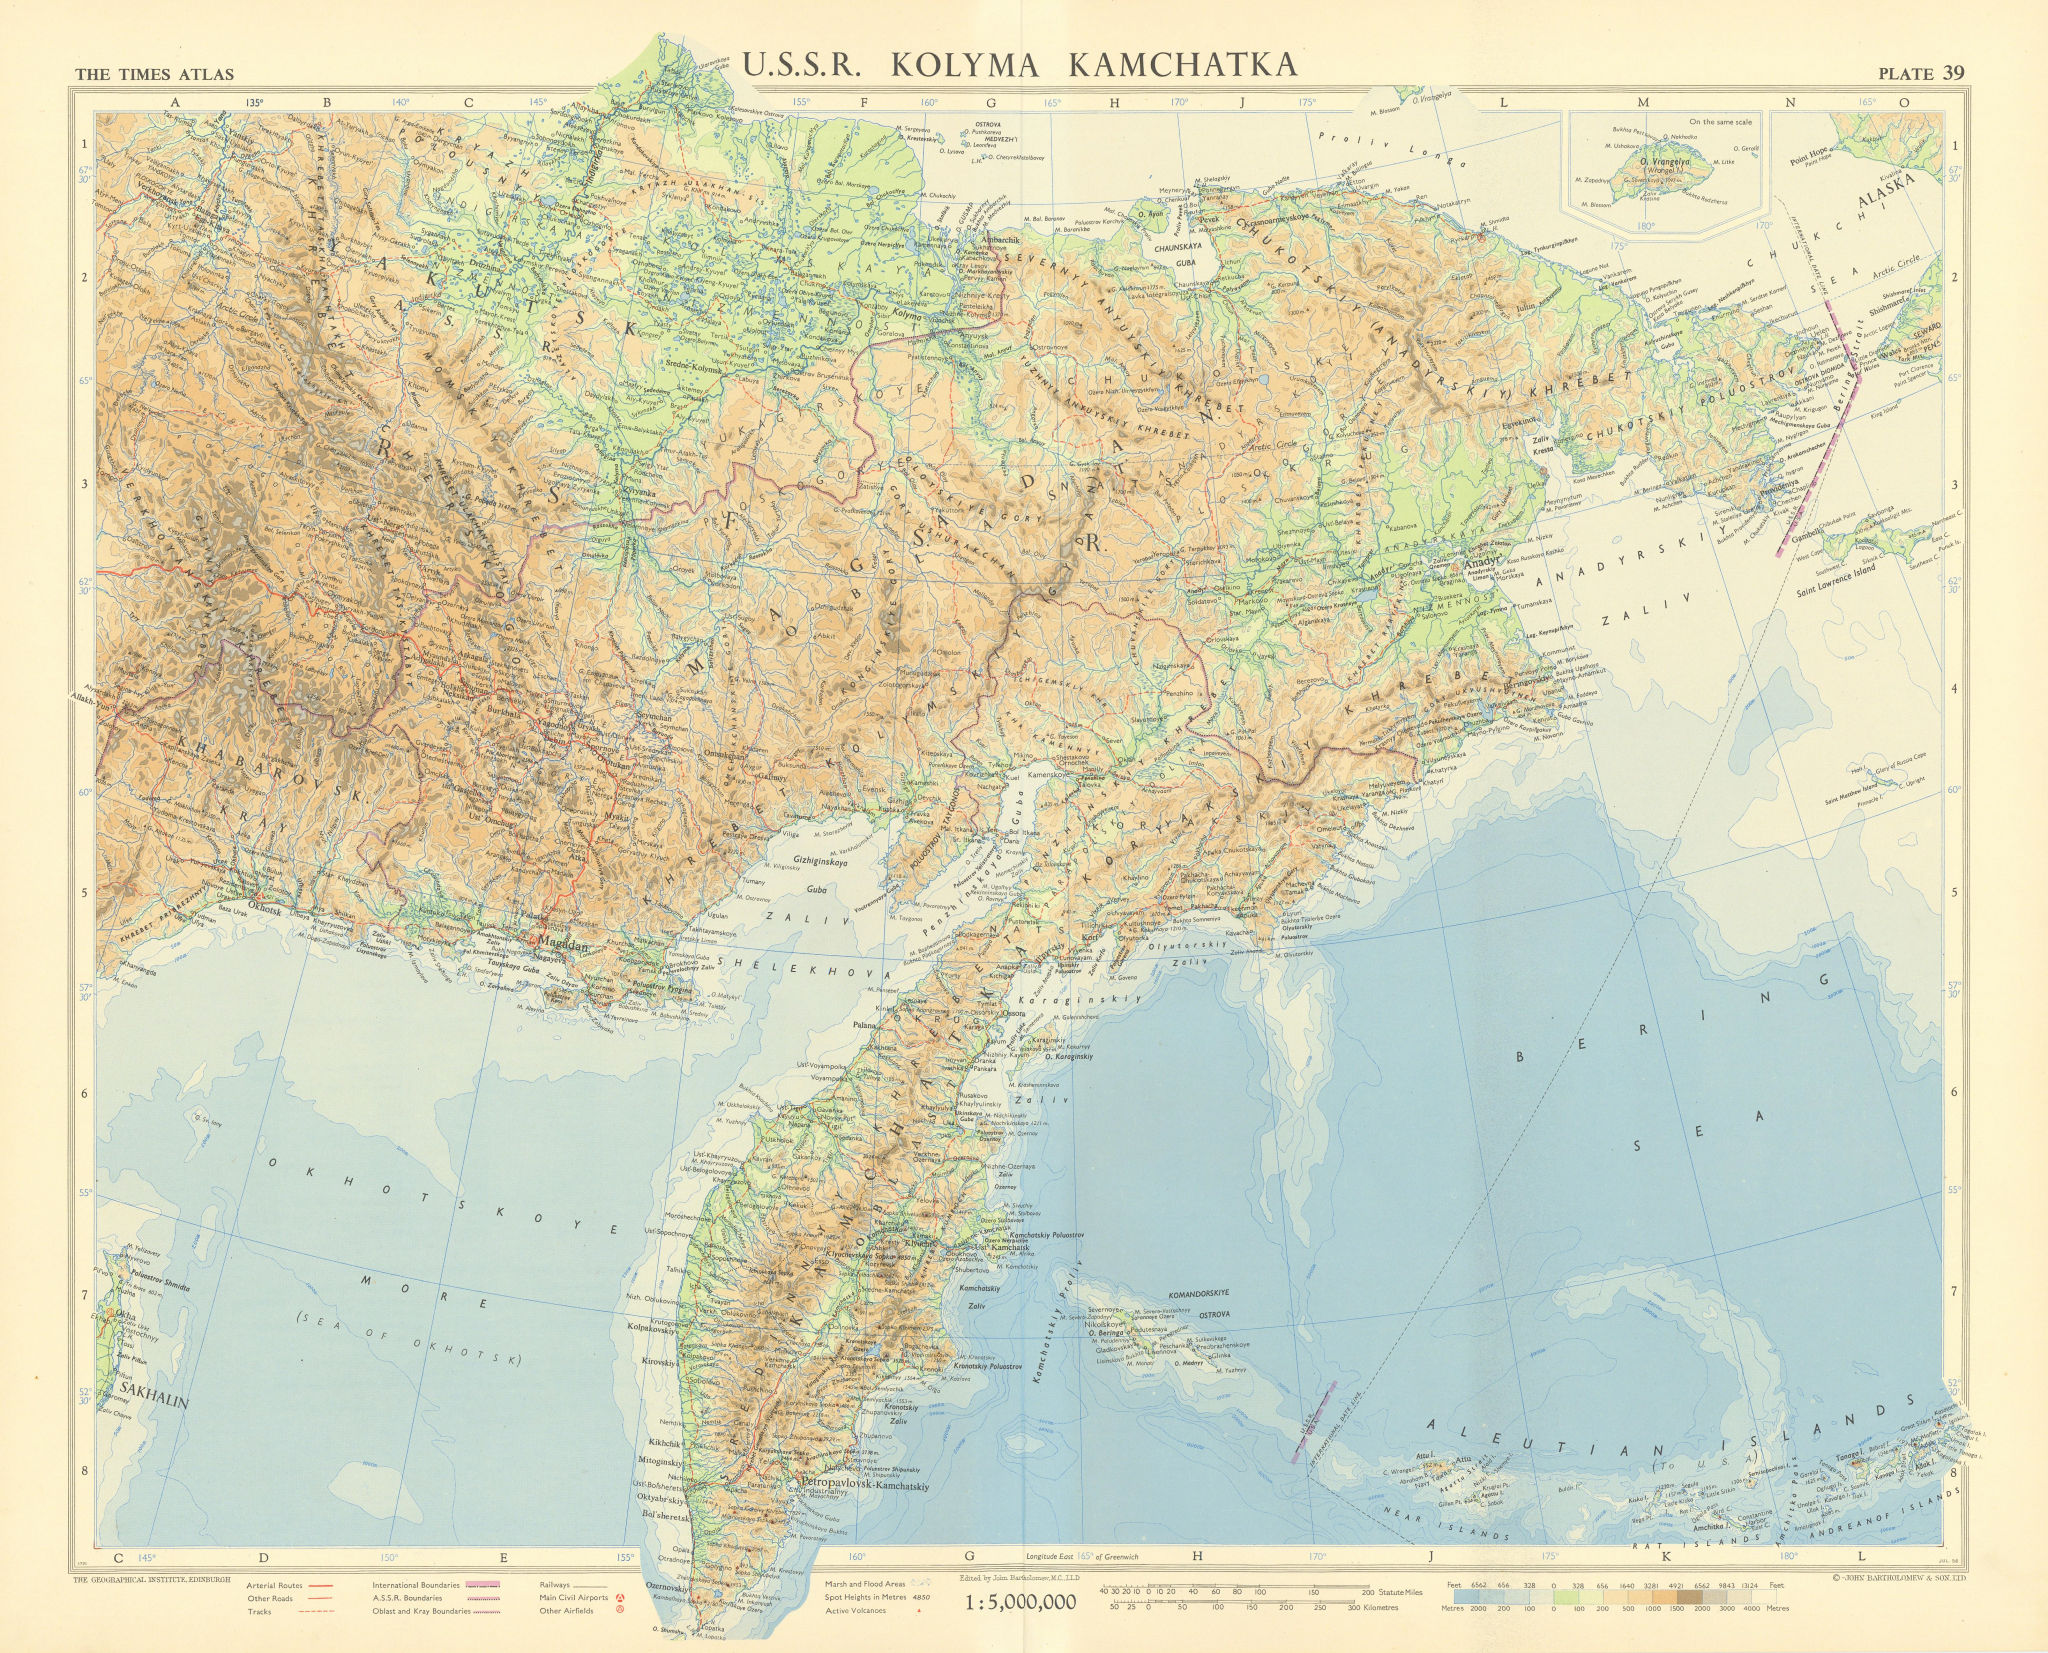 USSR Russian Far East. Kolyma Kamchatka Magadan Chukotka. TIMES 1959 old map